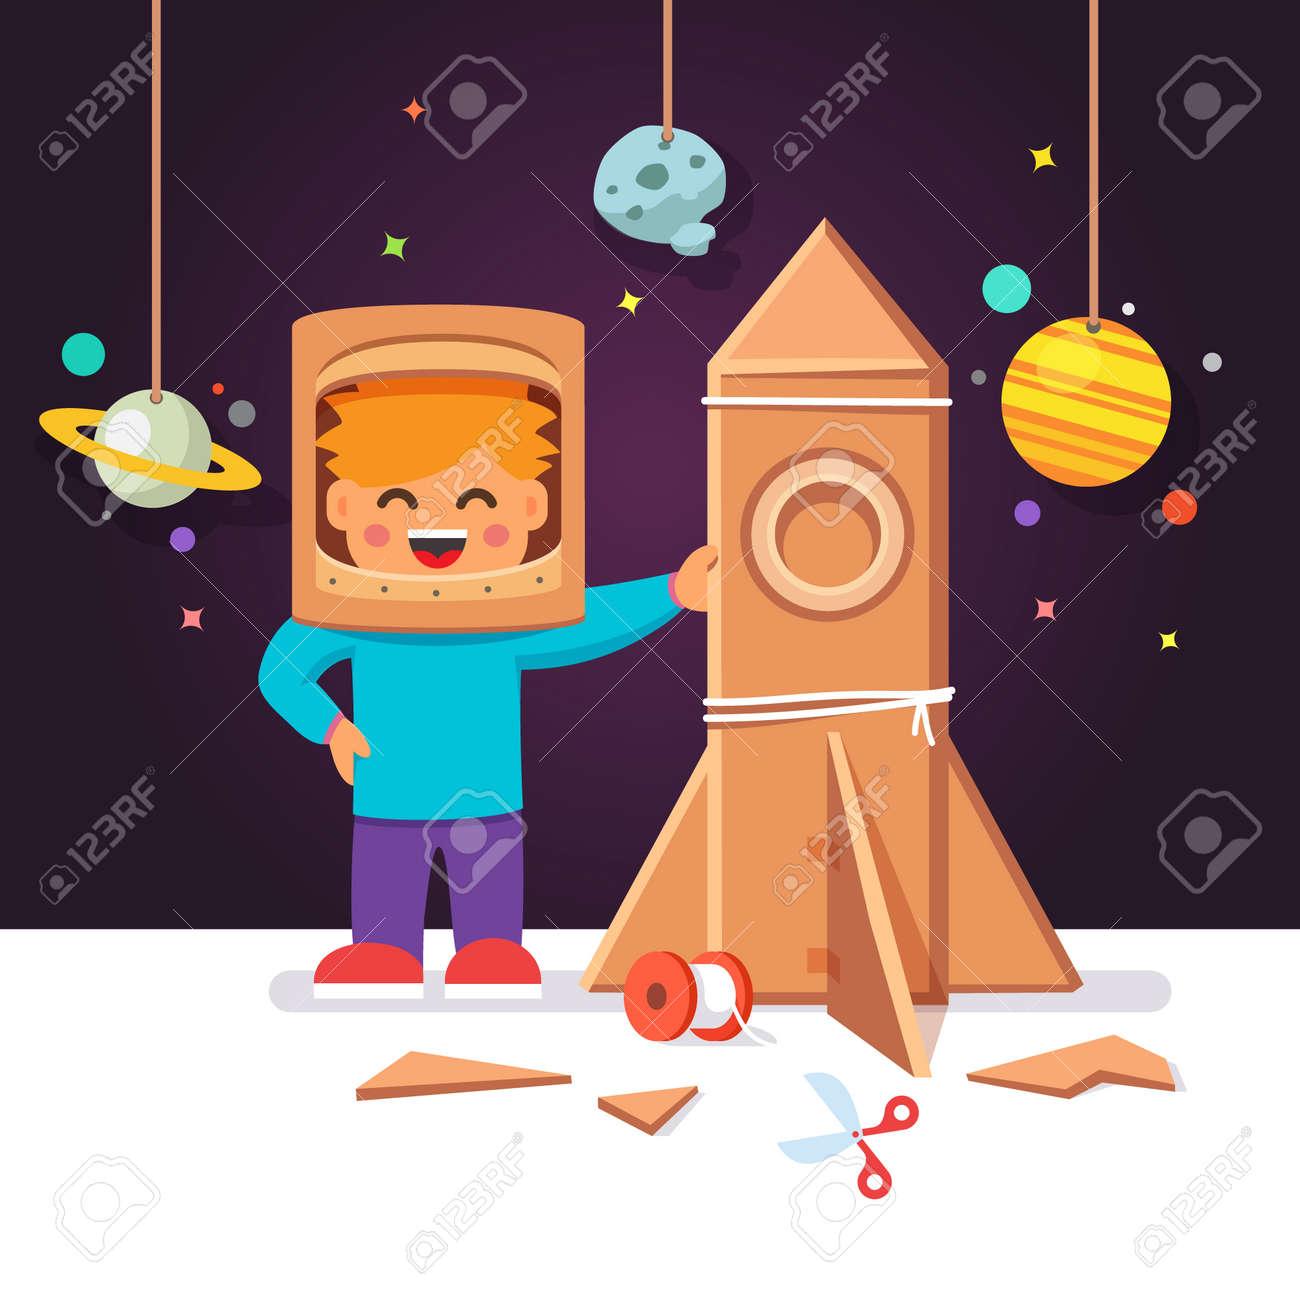 Kid Making Cardboard Box Rocket And Astronaut Costume Helmet